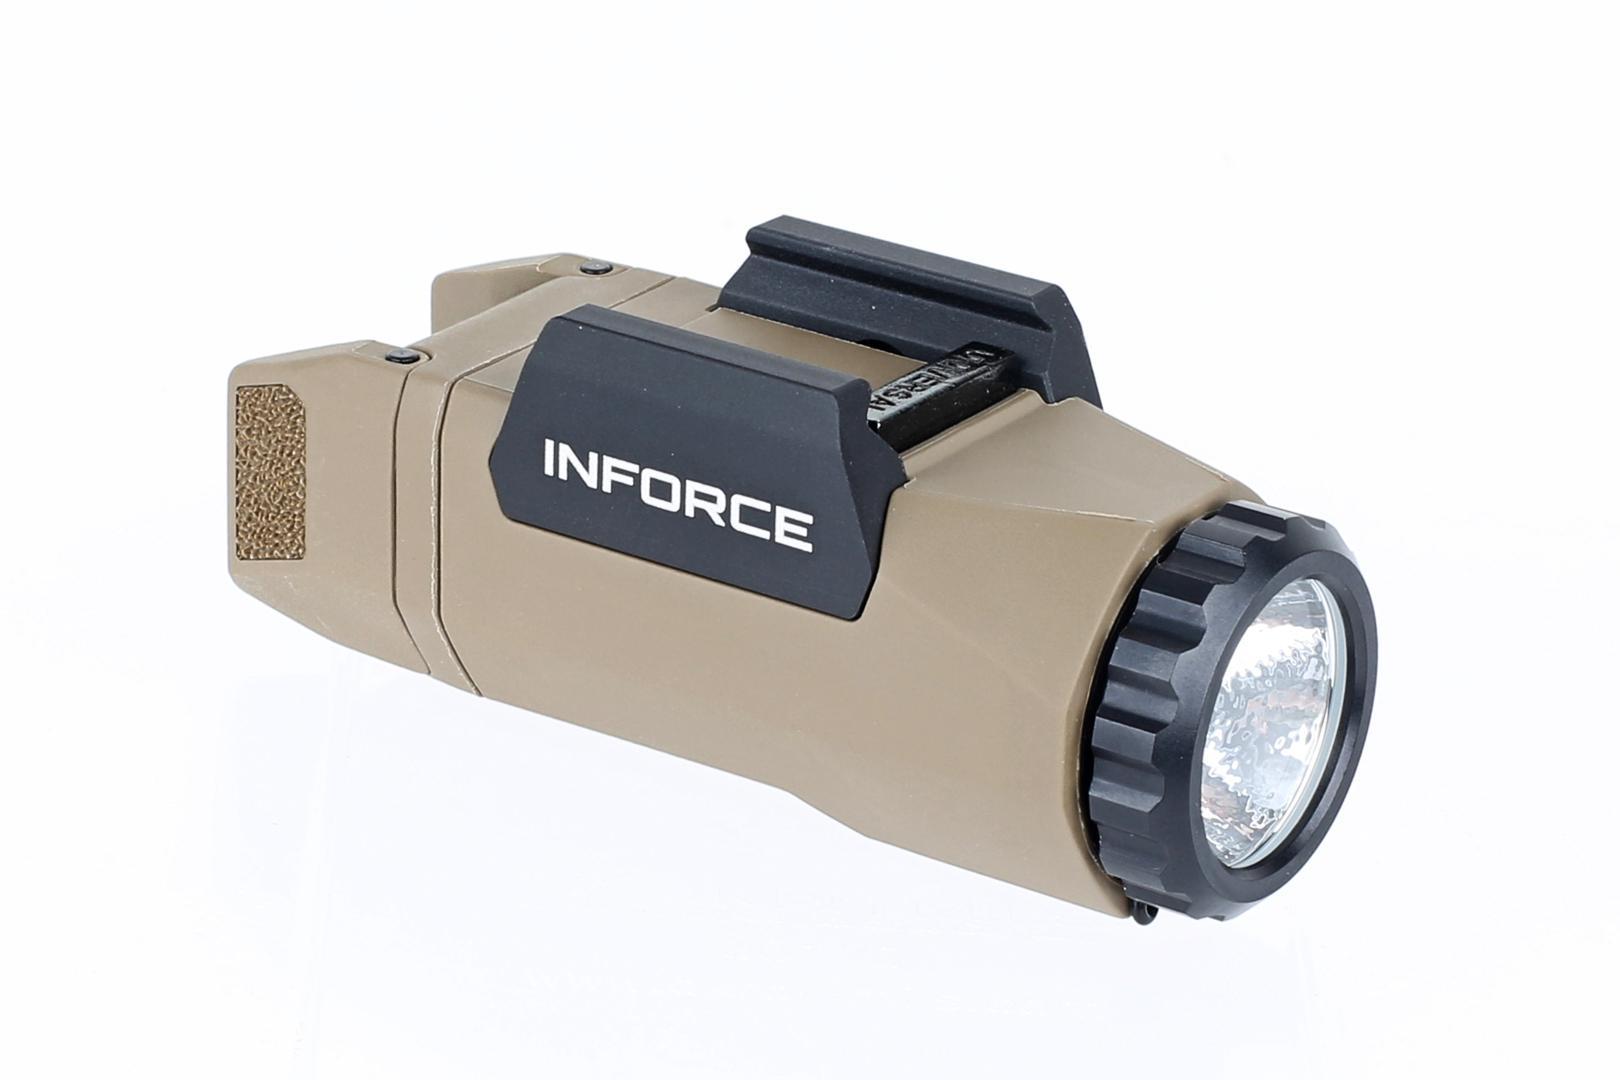 Inforce APL Gen 3 Auto Pistol Light - 400 Lumens - FDE